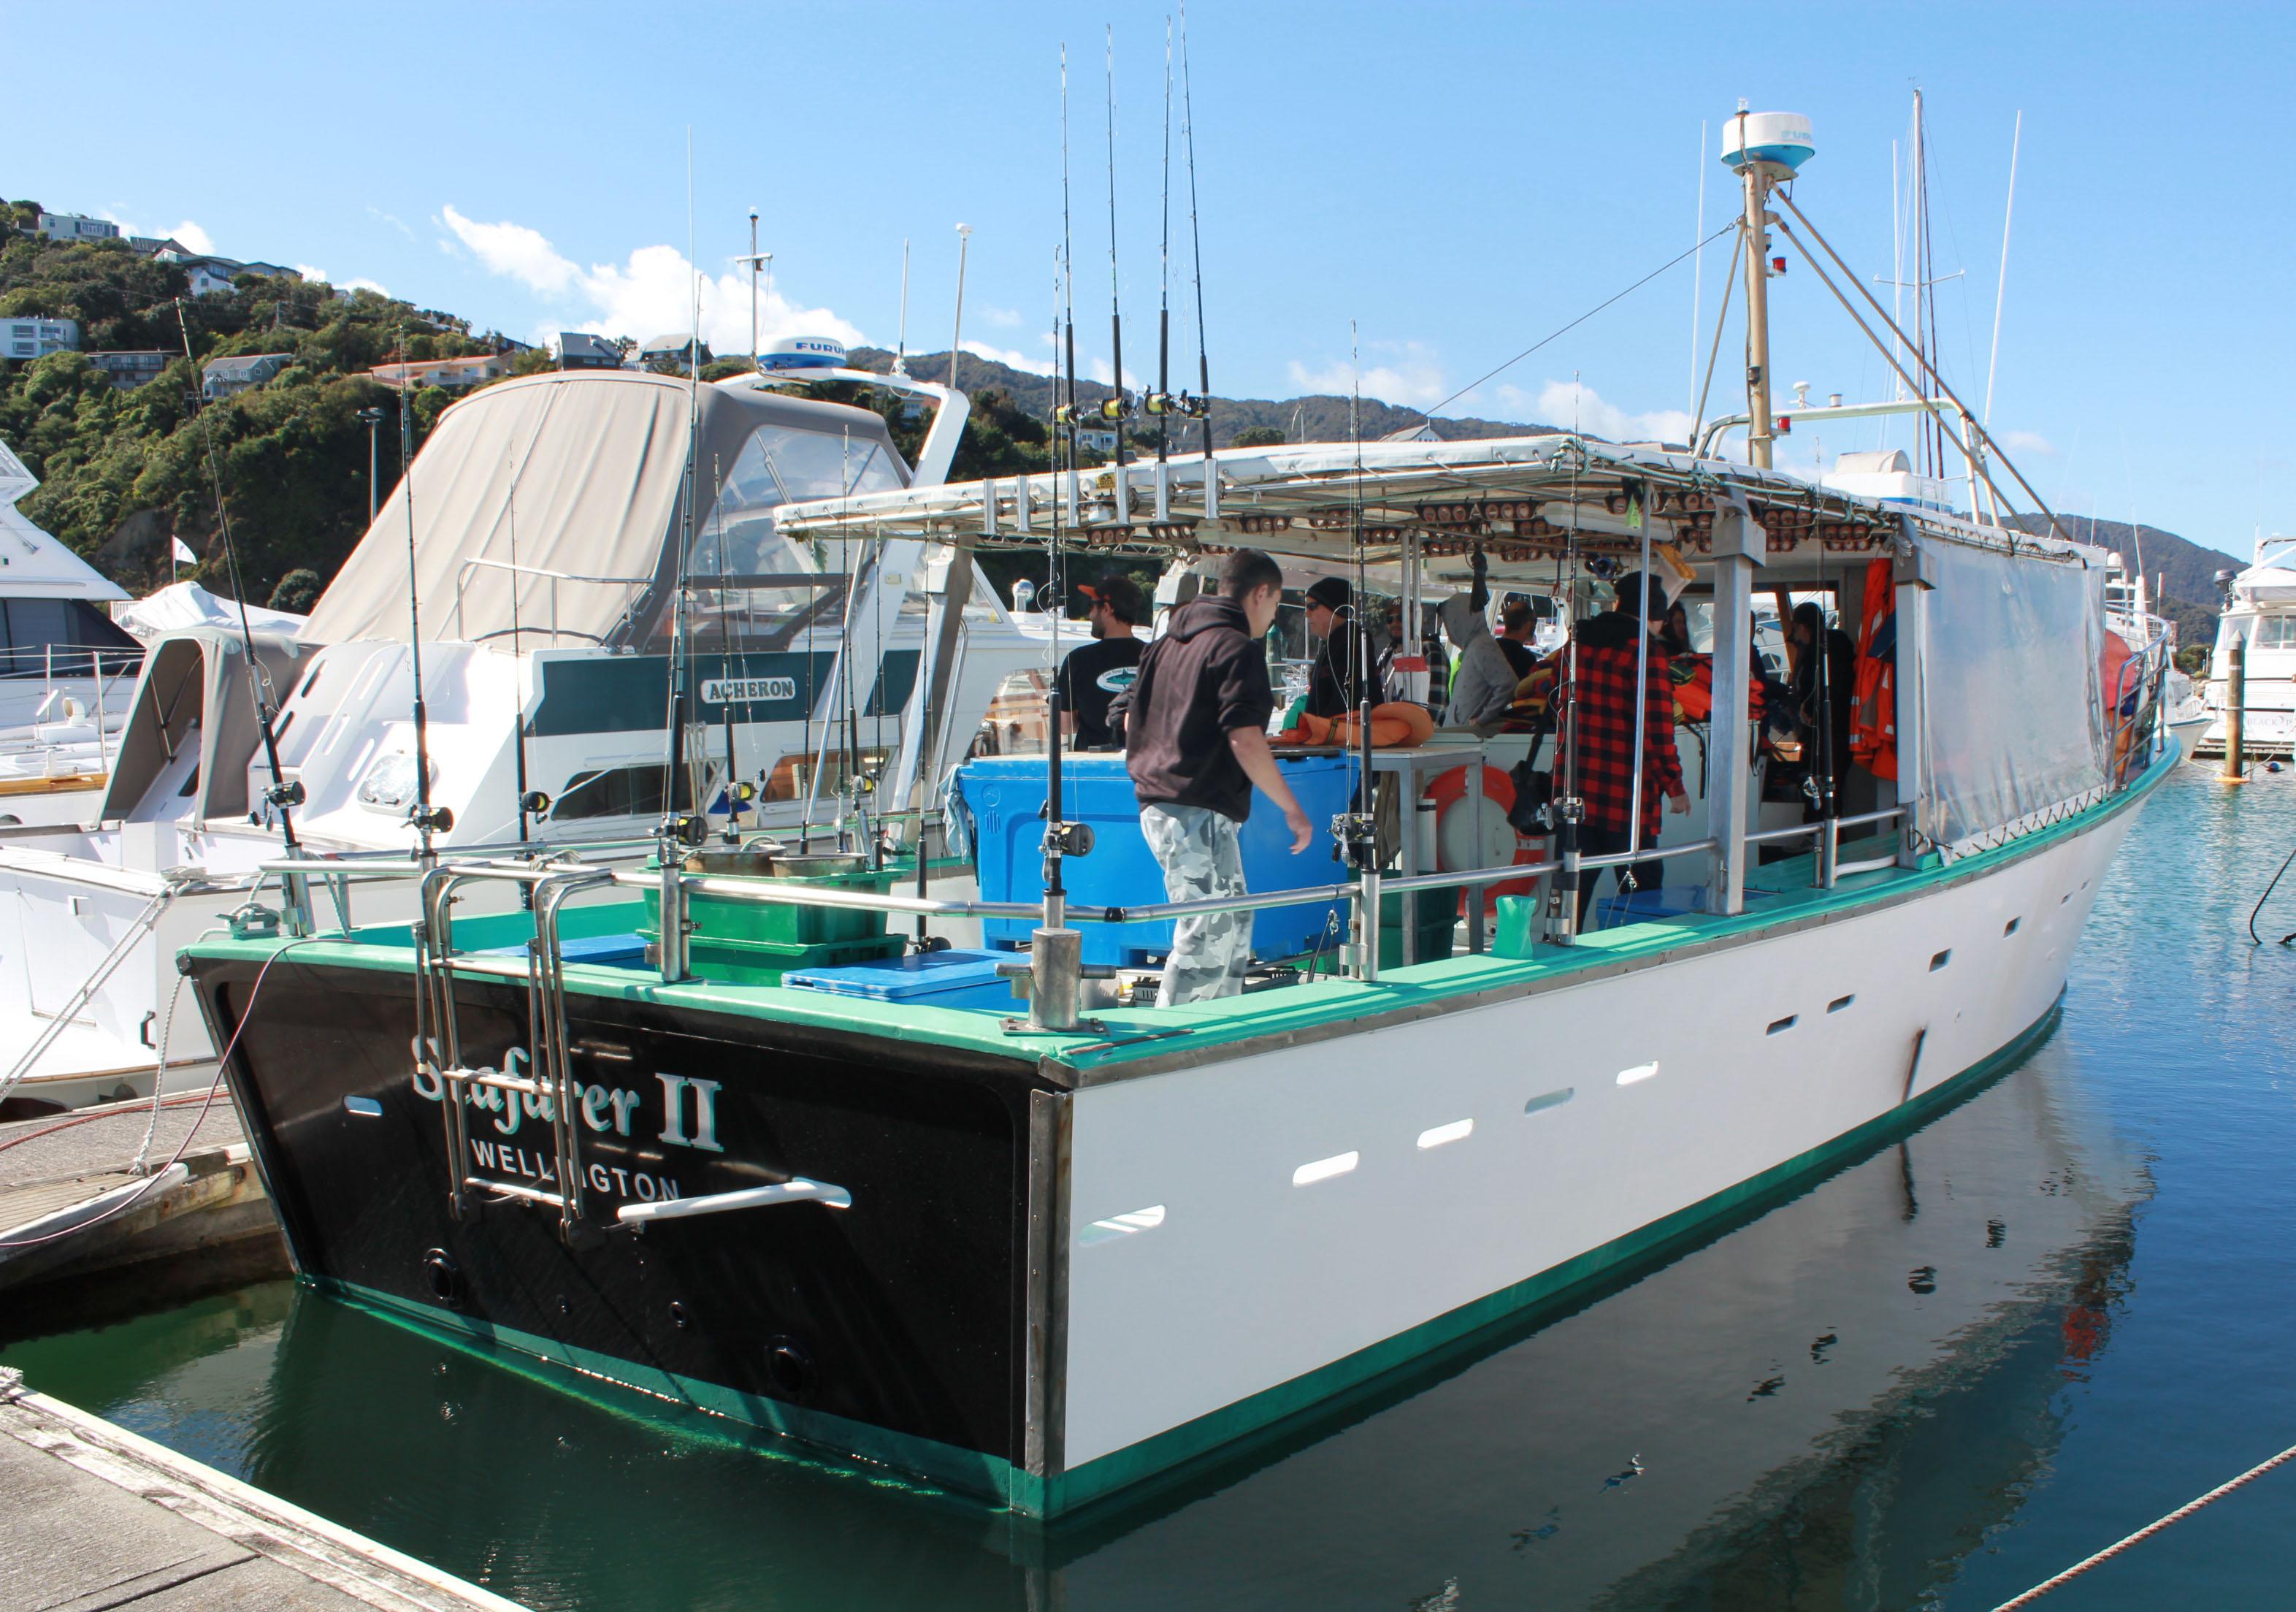 A dozen people, plus their IDEA Services support staff, enjoy day's fishing courtesy of the IHC Mana-Kapiti Association.